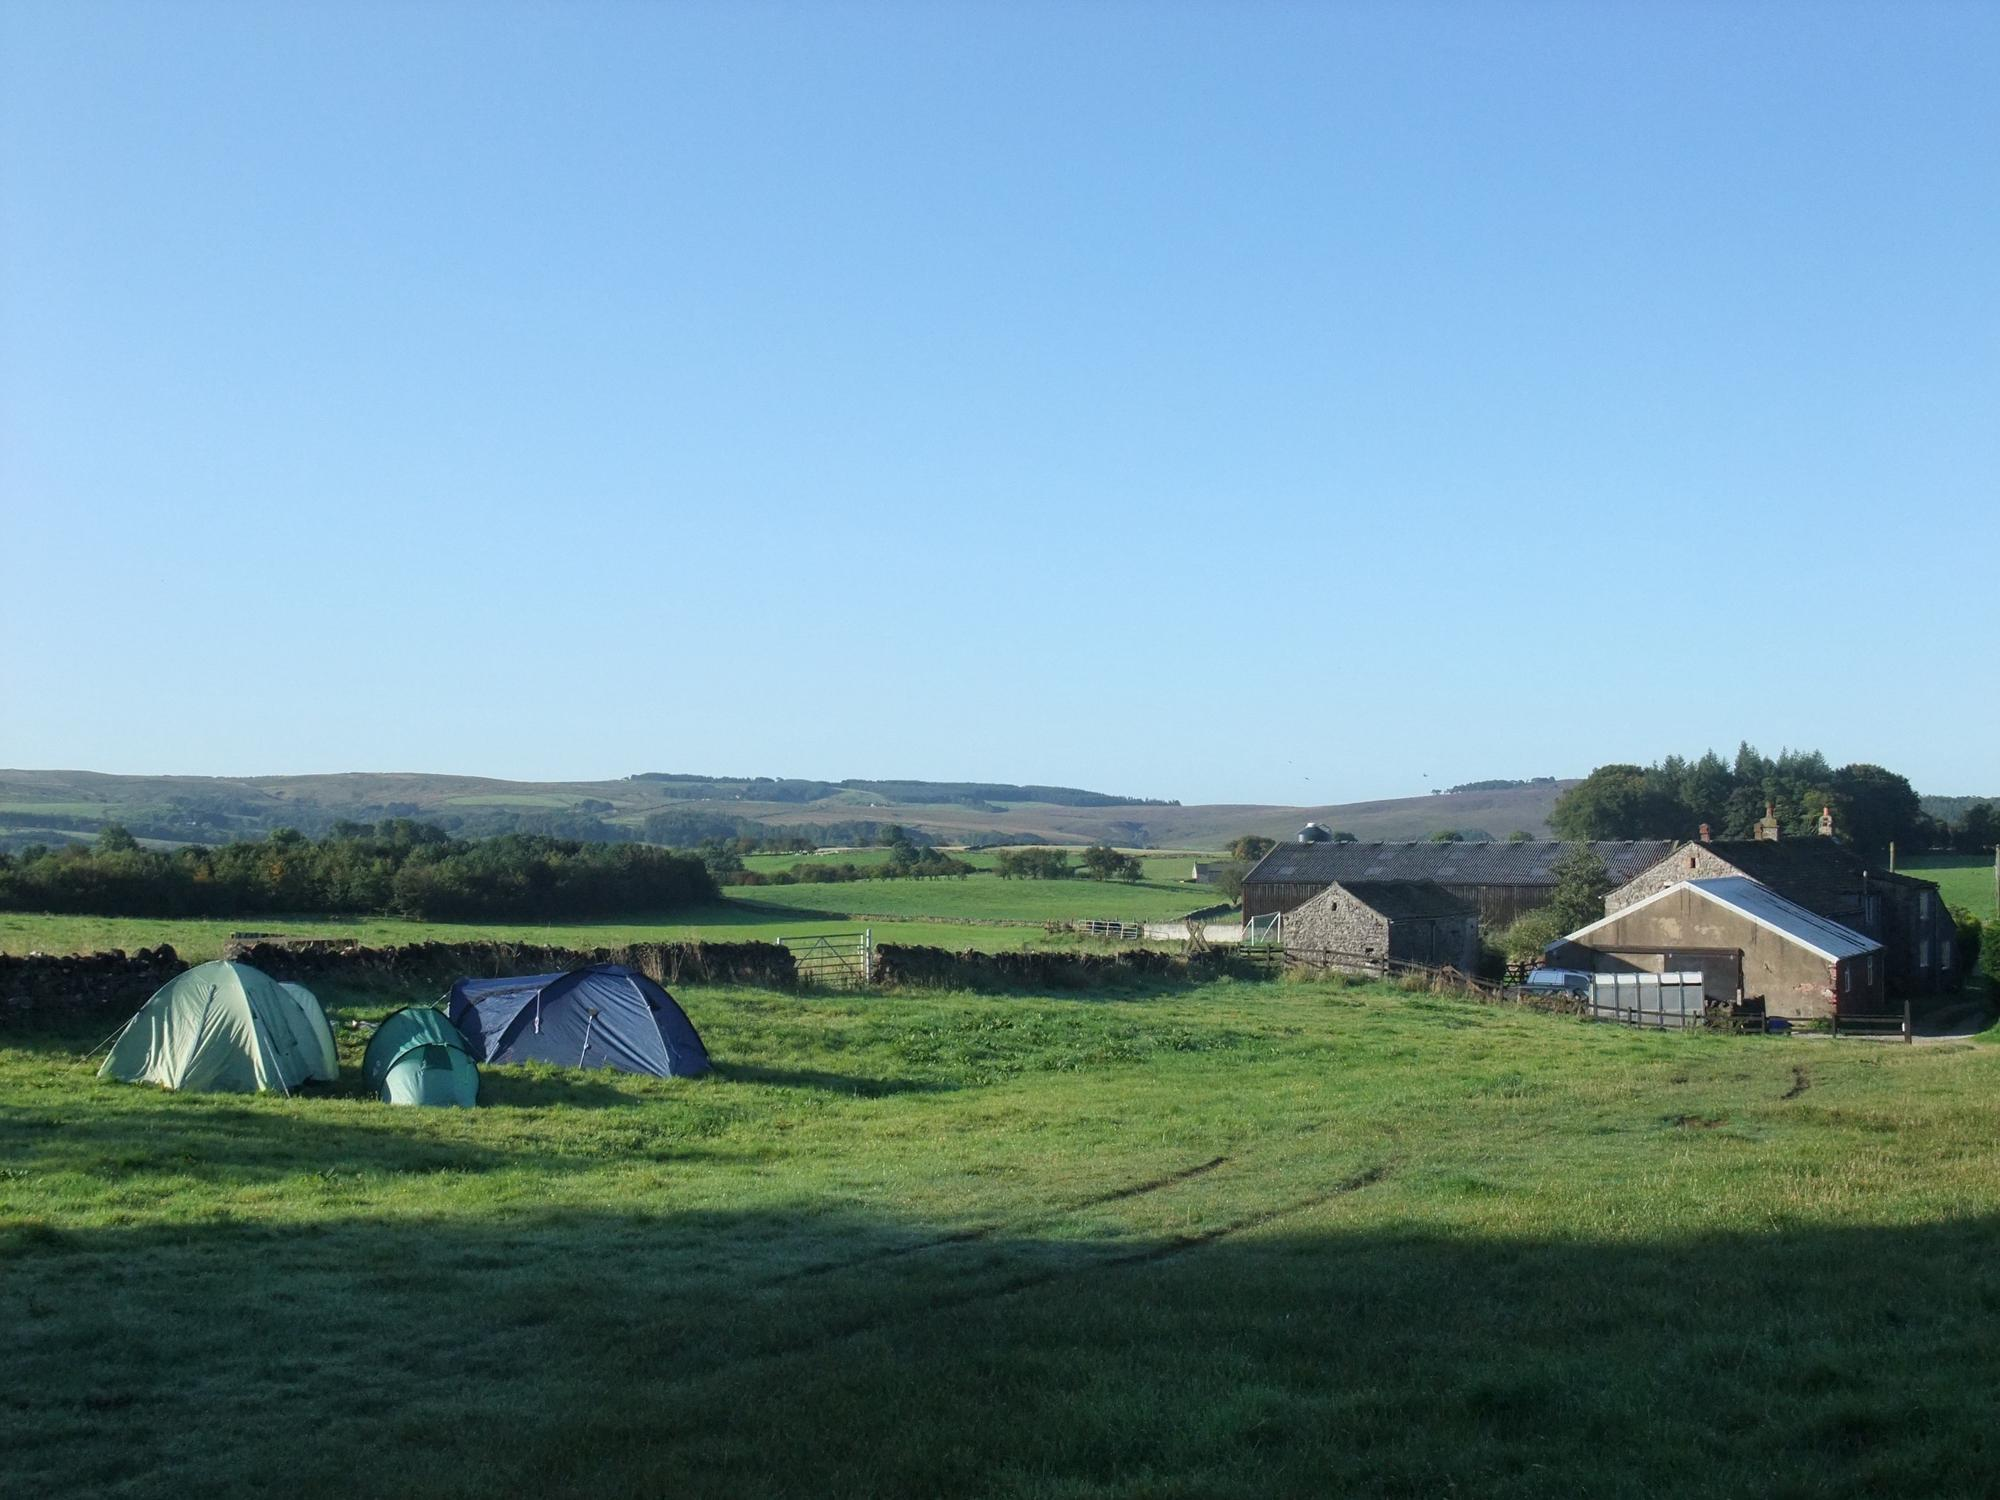 Camping near Manchester | Best Manchester Campsites